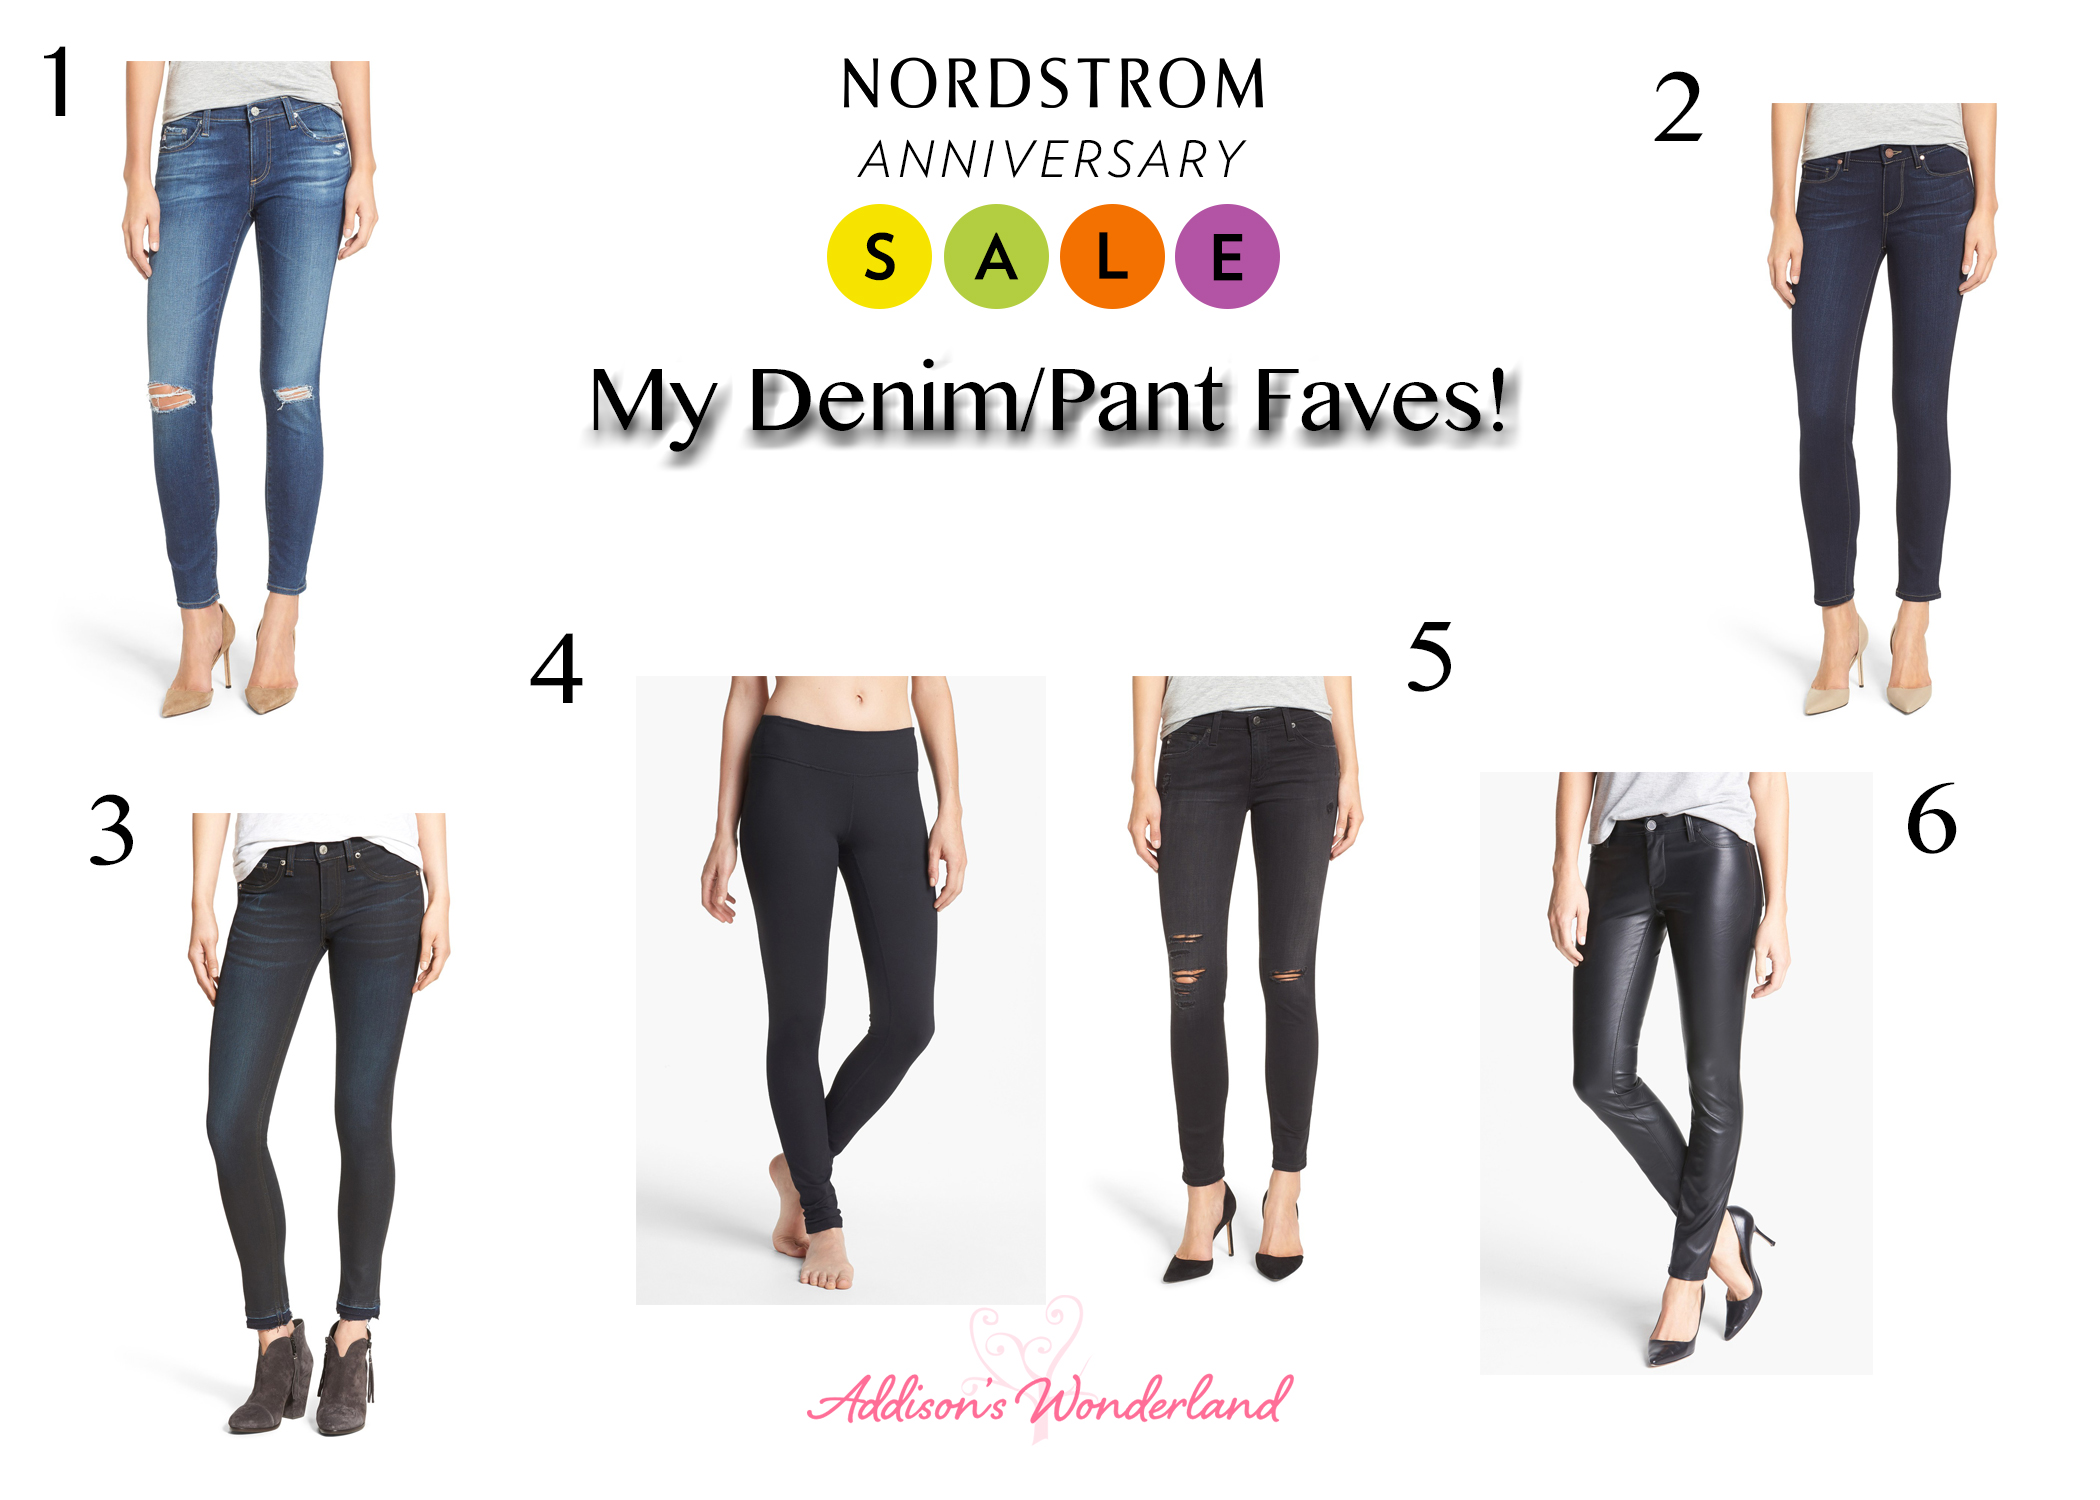 Nordstrom Anniversary Sale Denim Pants